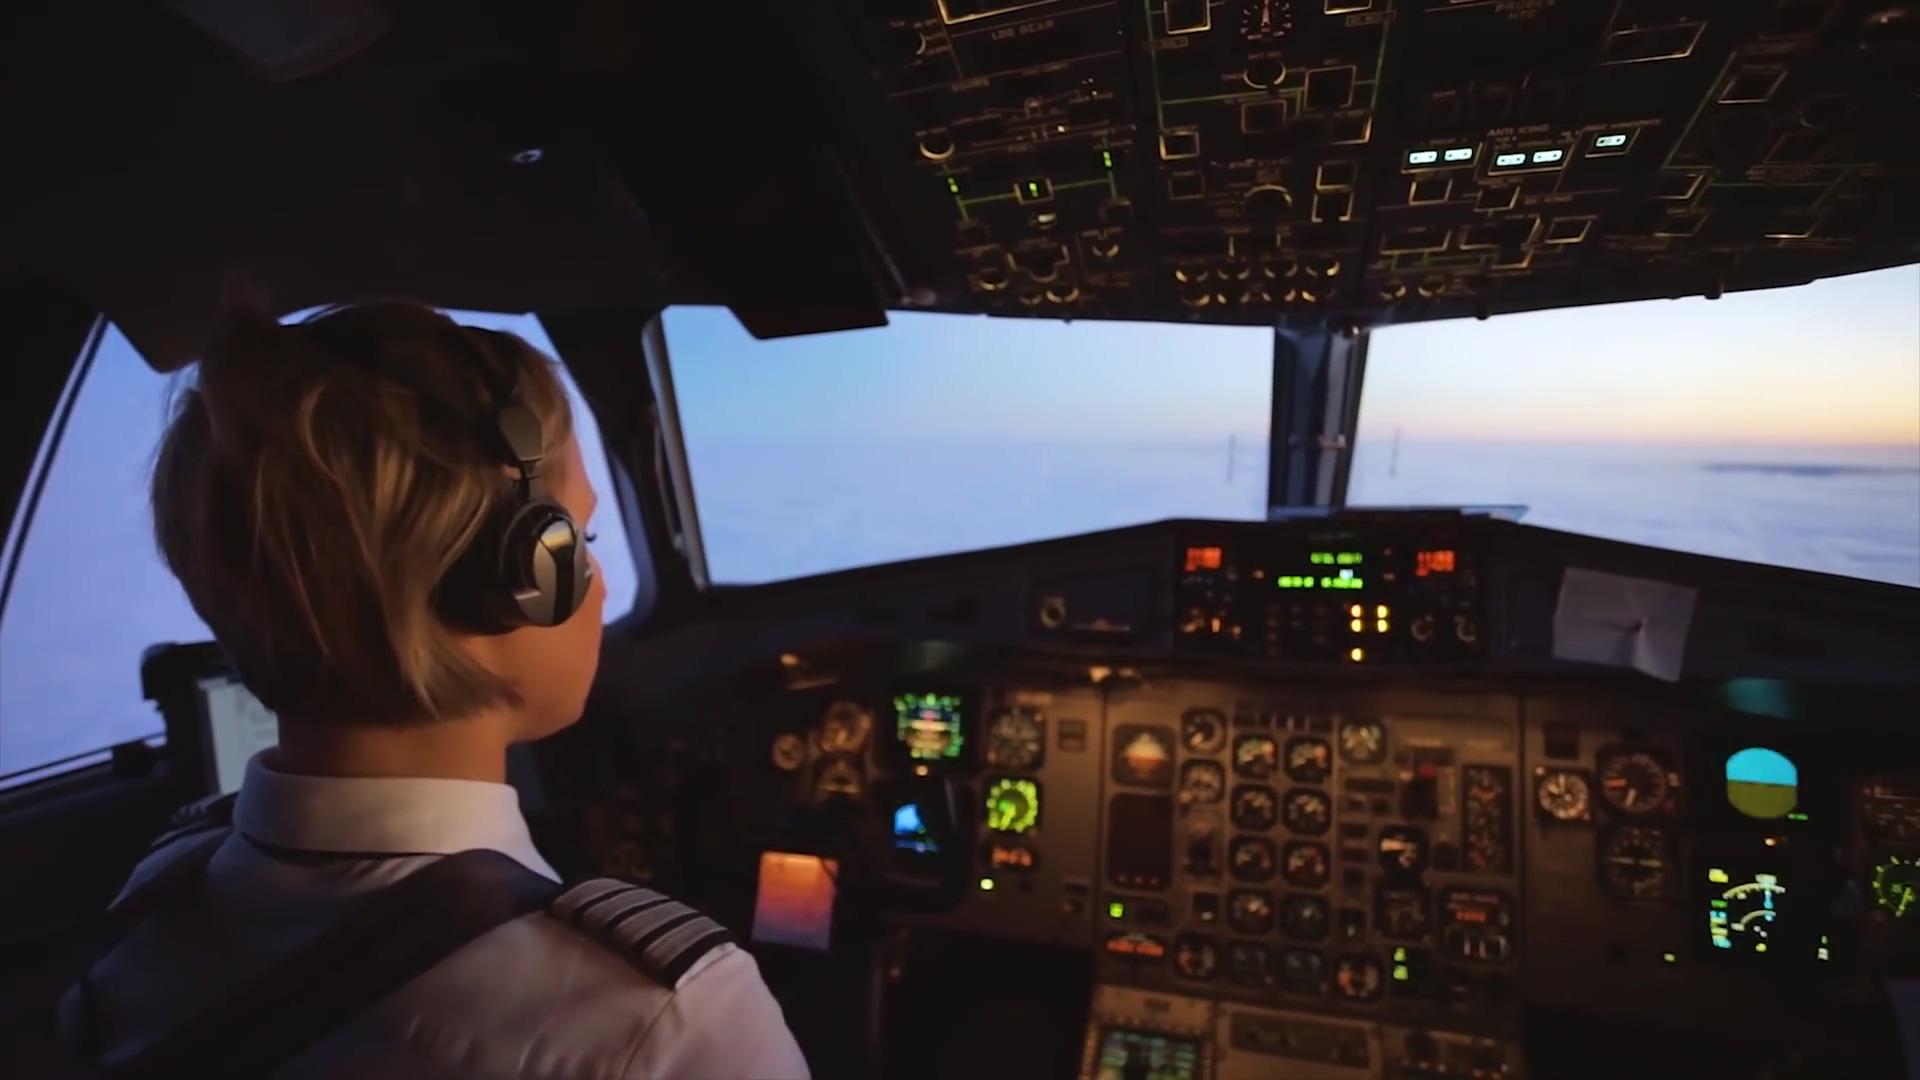 Norra - Nordic regional airlines - Emma